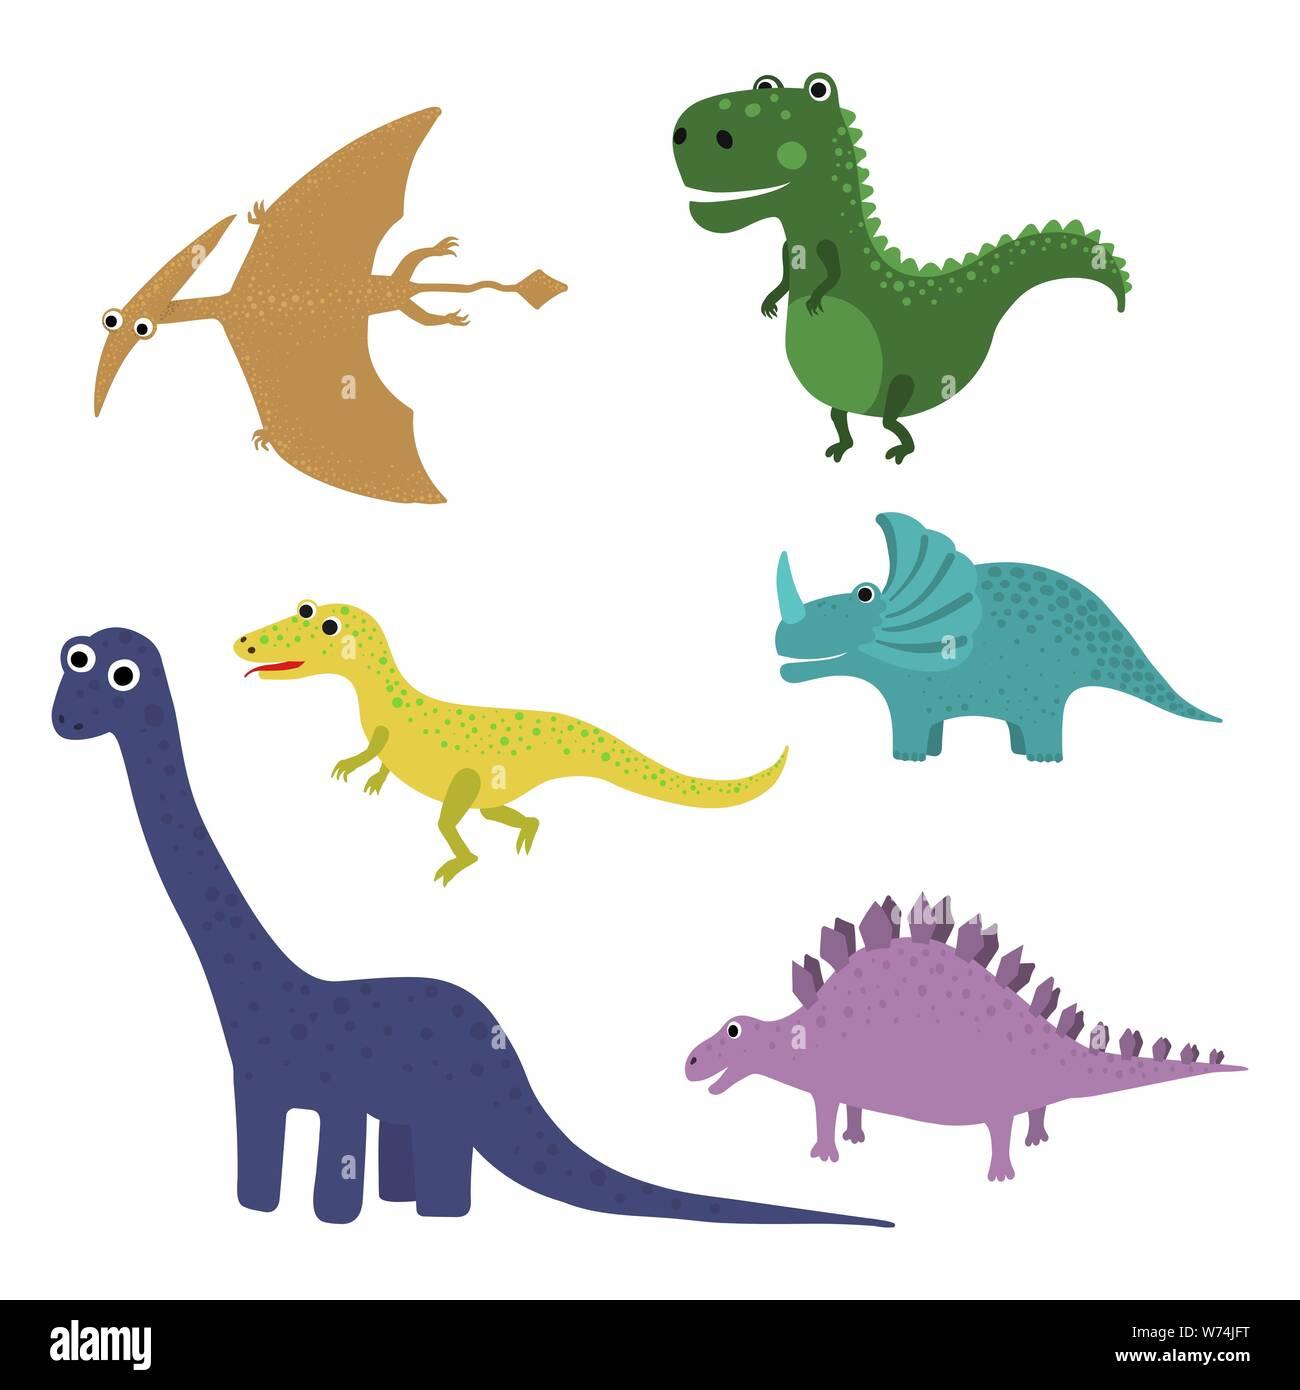 Cartoon Dinosaurs High Resolution Stock Photography And Images Page 6 Alamy Dinosaurs dinosaur dinosaurio jurassicpark paleoart dinosaurart prehistoric dinosauria drawing. alamy